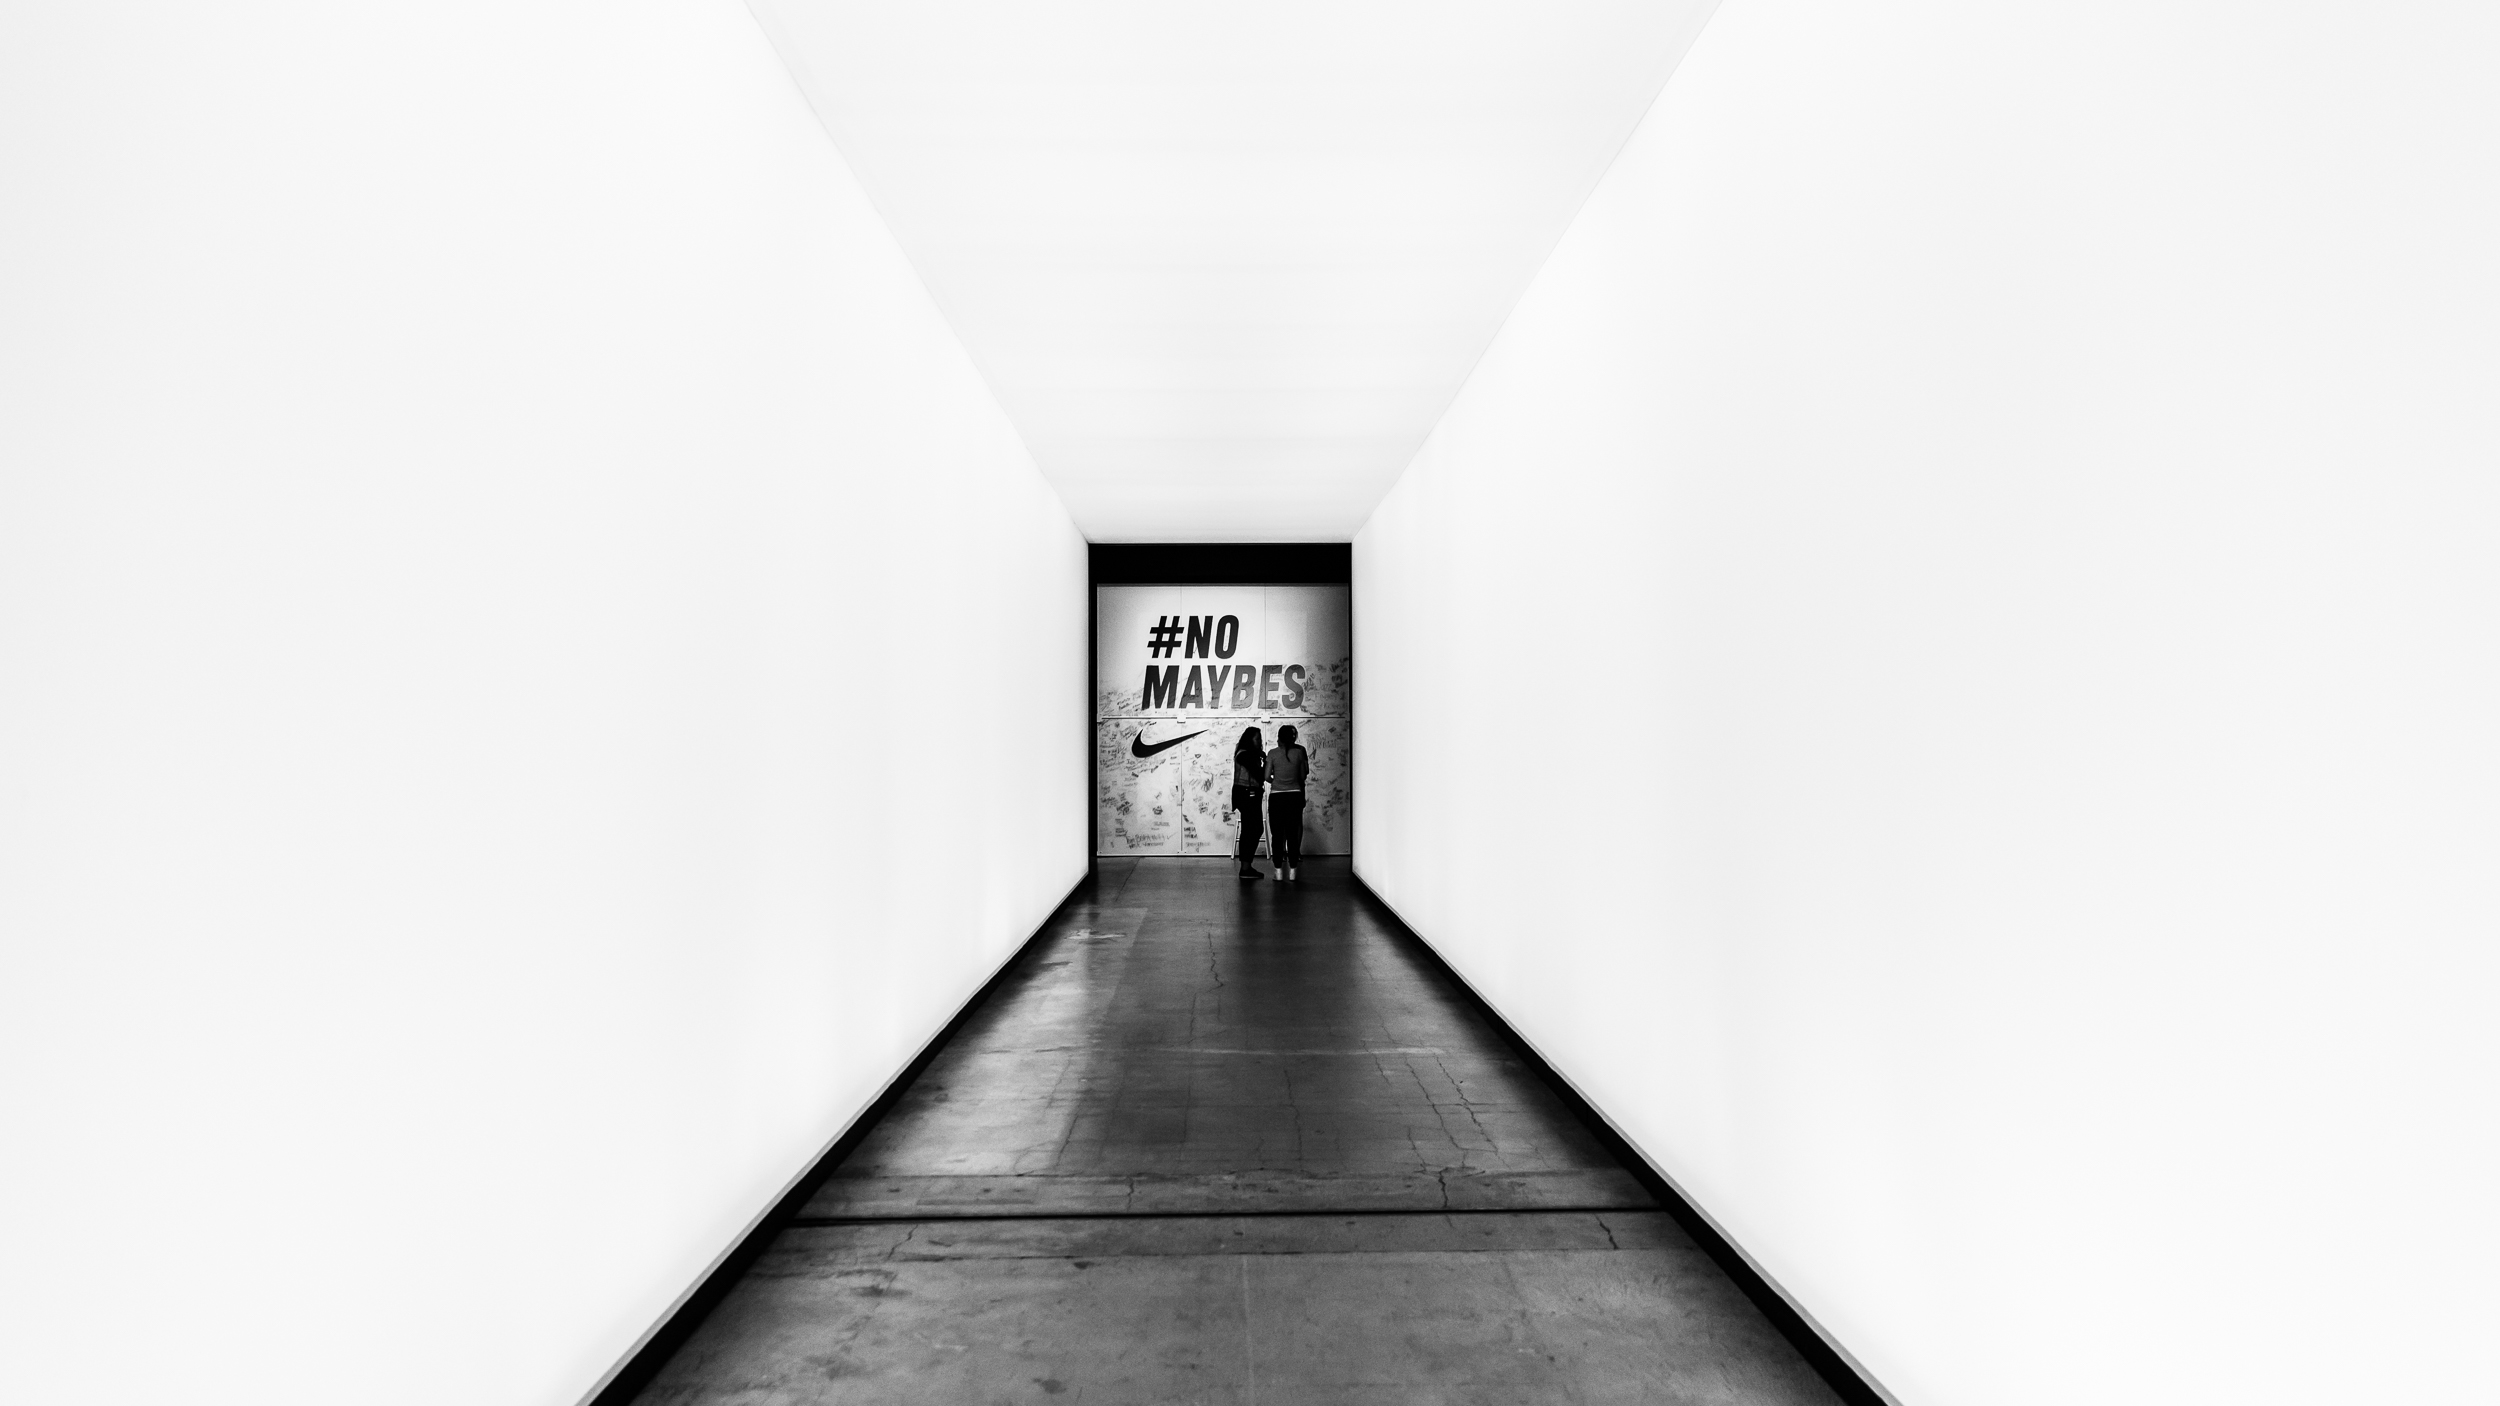 NIKE-Underground-image1.jpg